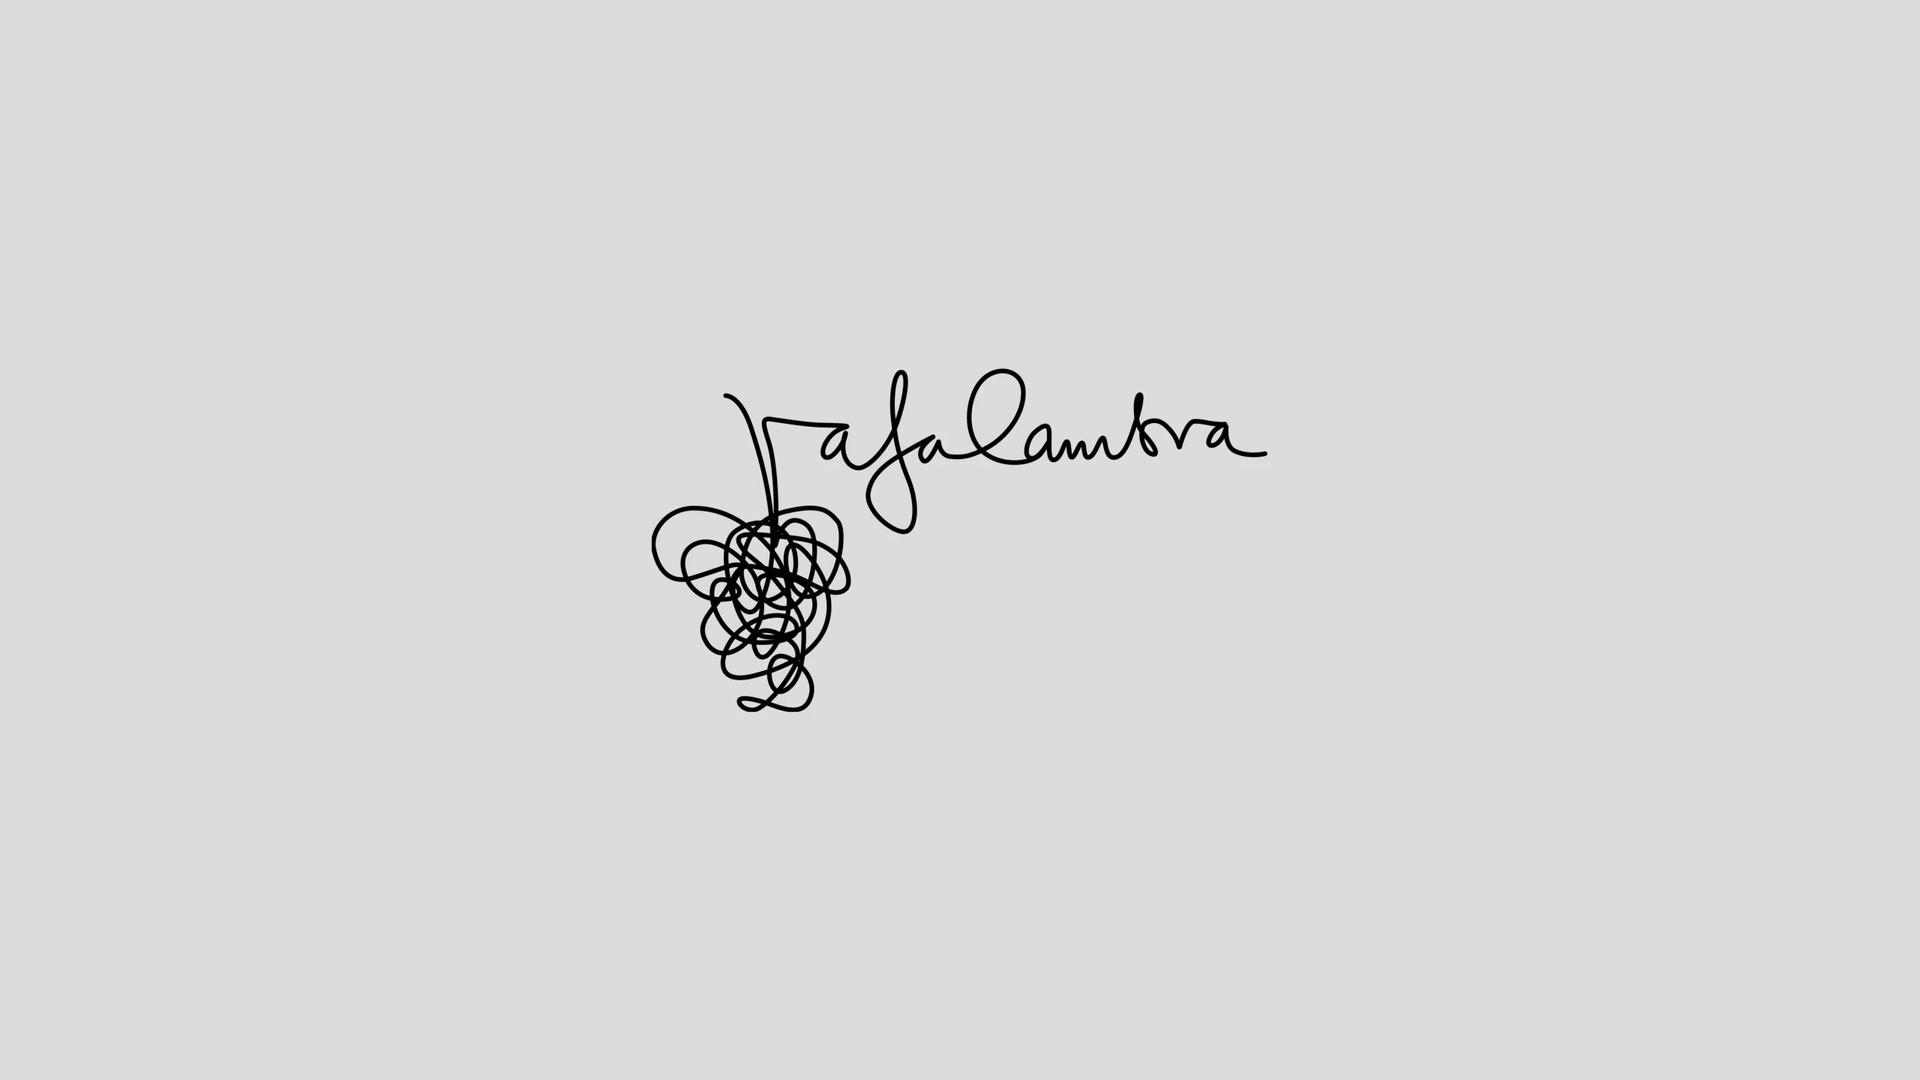 efecte escritura logo Rafa Cambra 2560x1